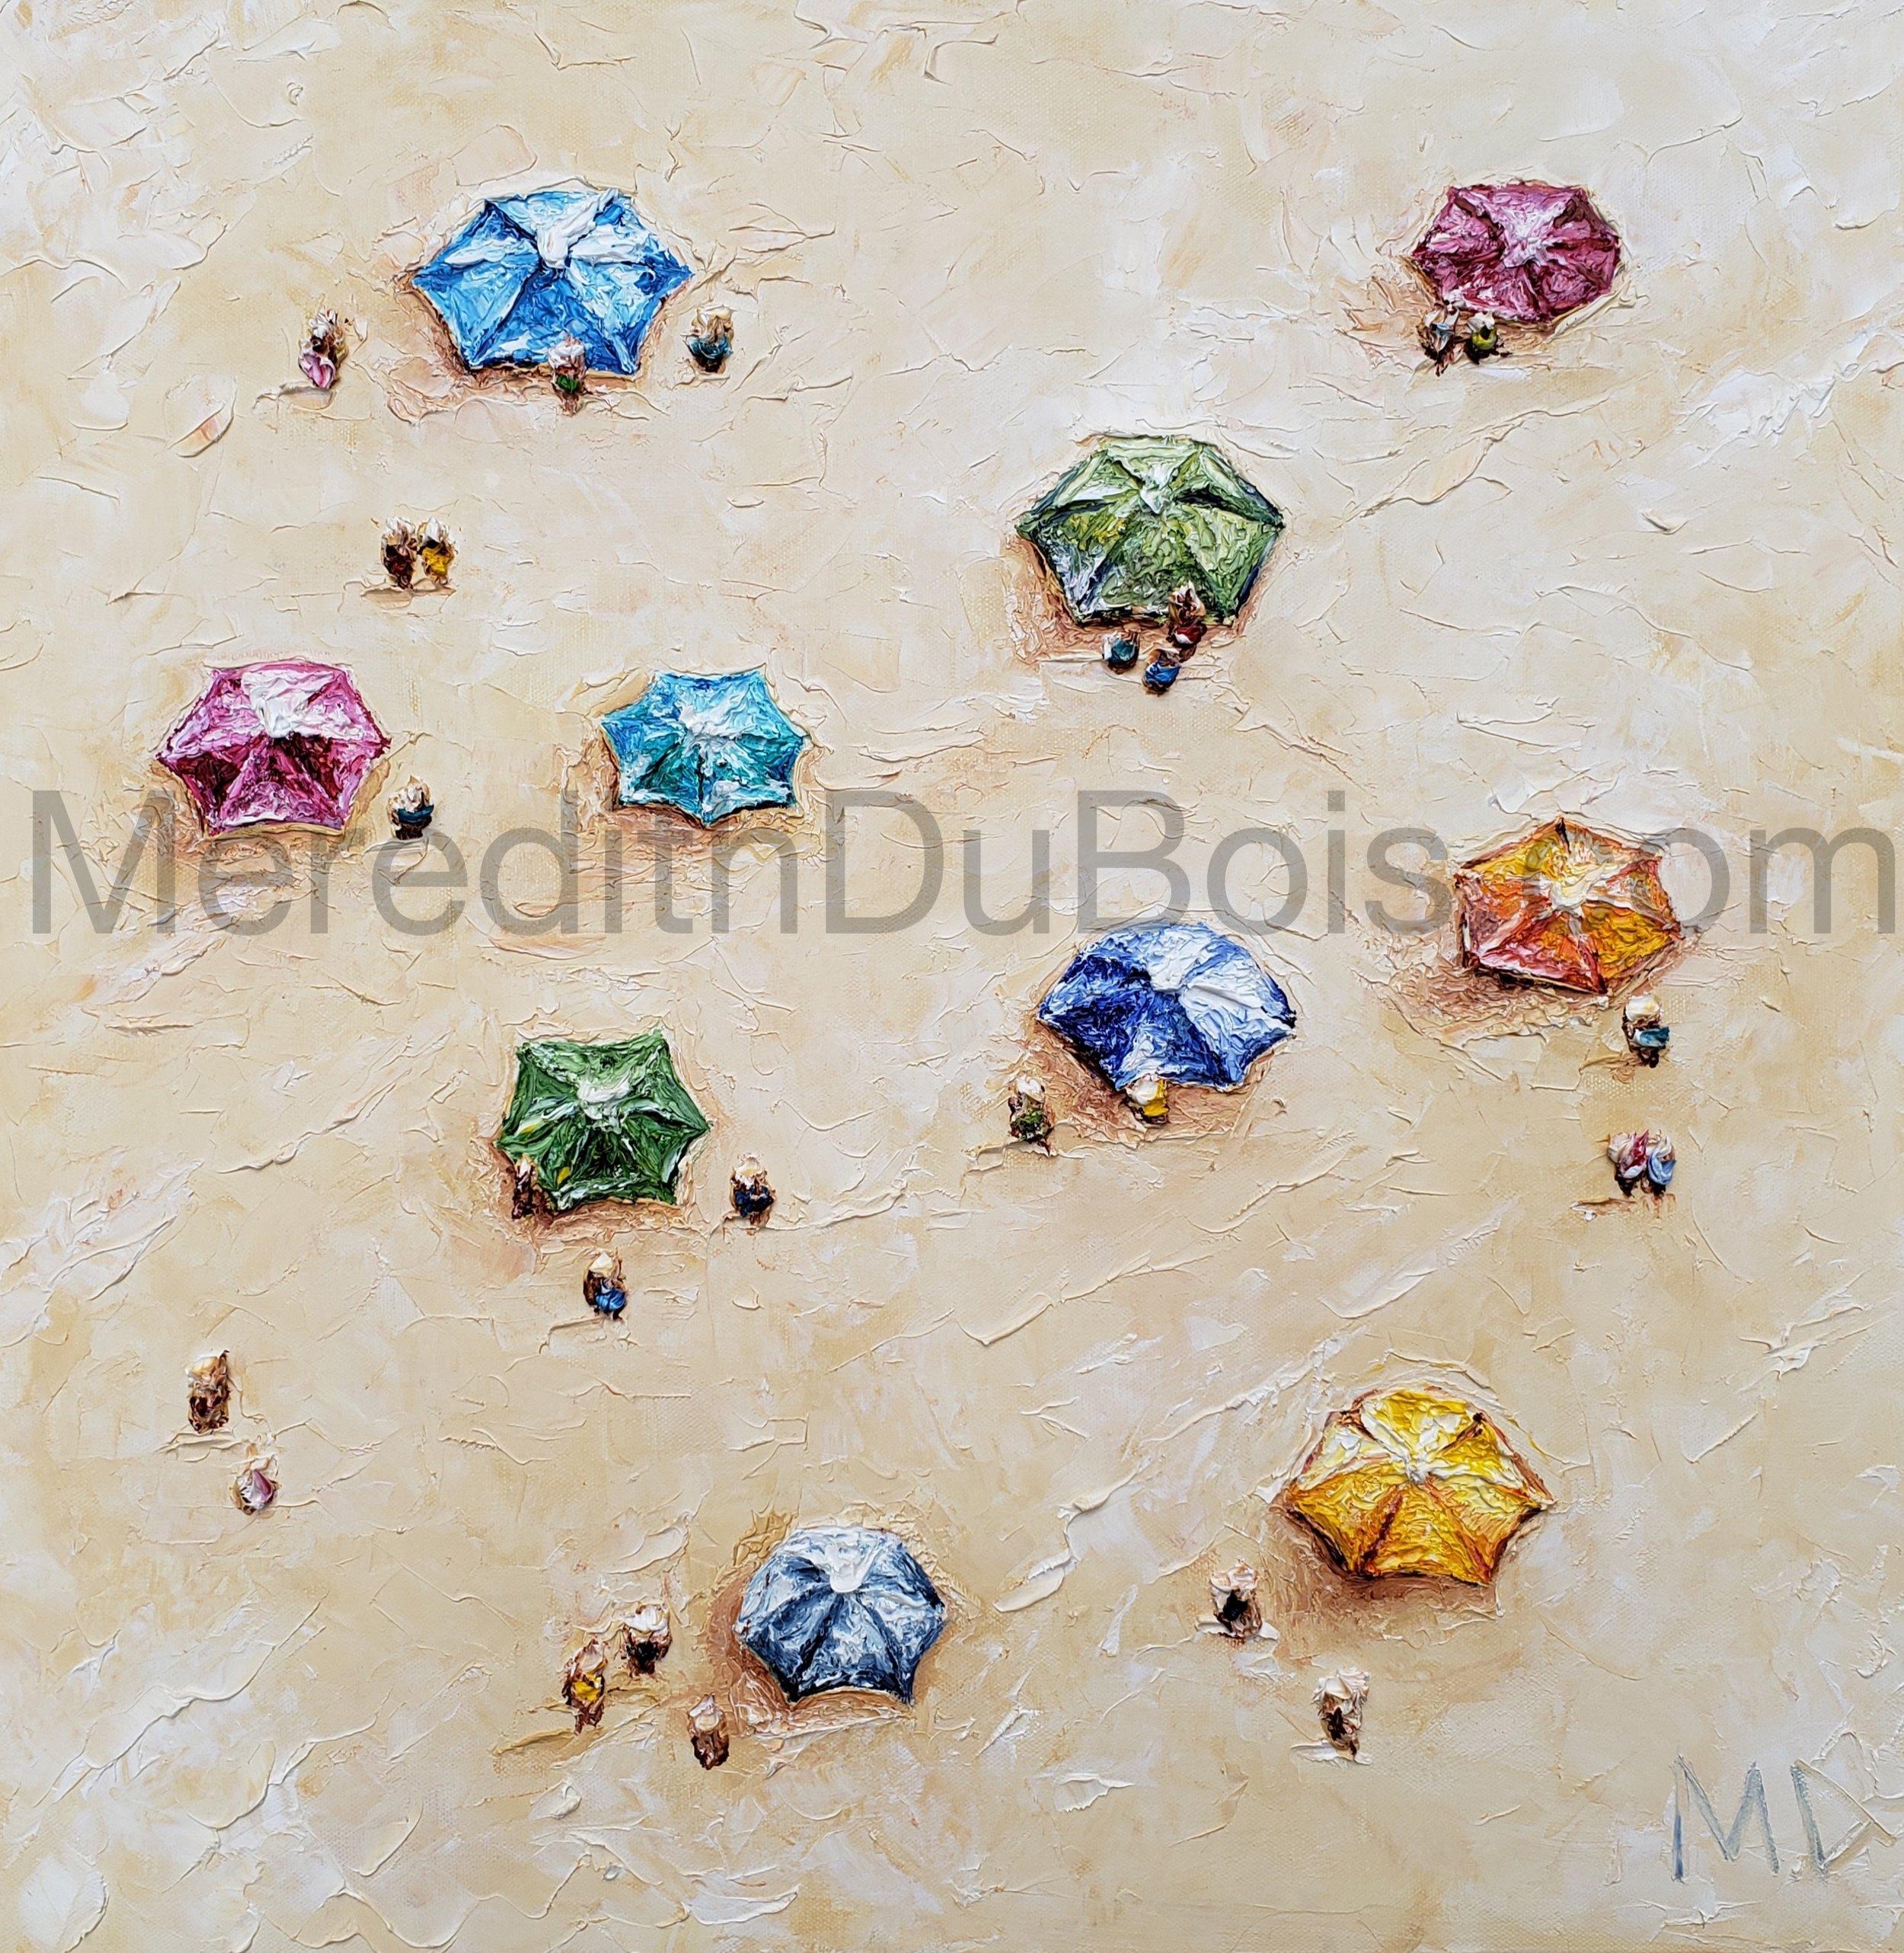 Umbrella Tops | 24x24 | Oil on canvas | $500 | Sold